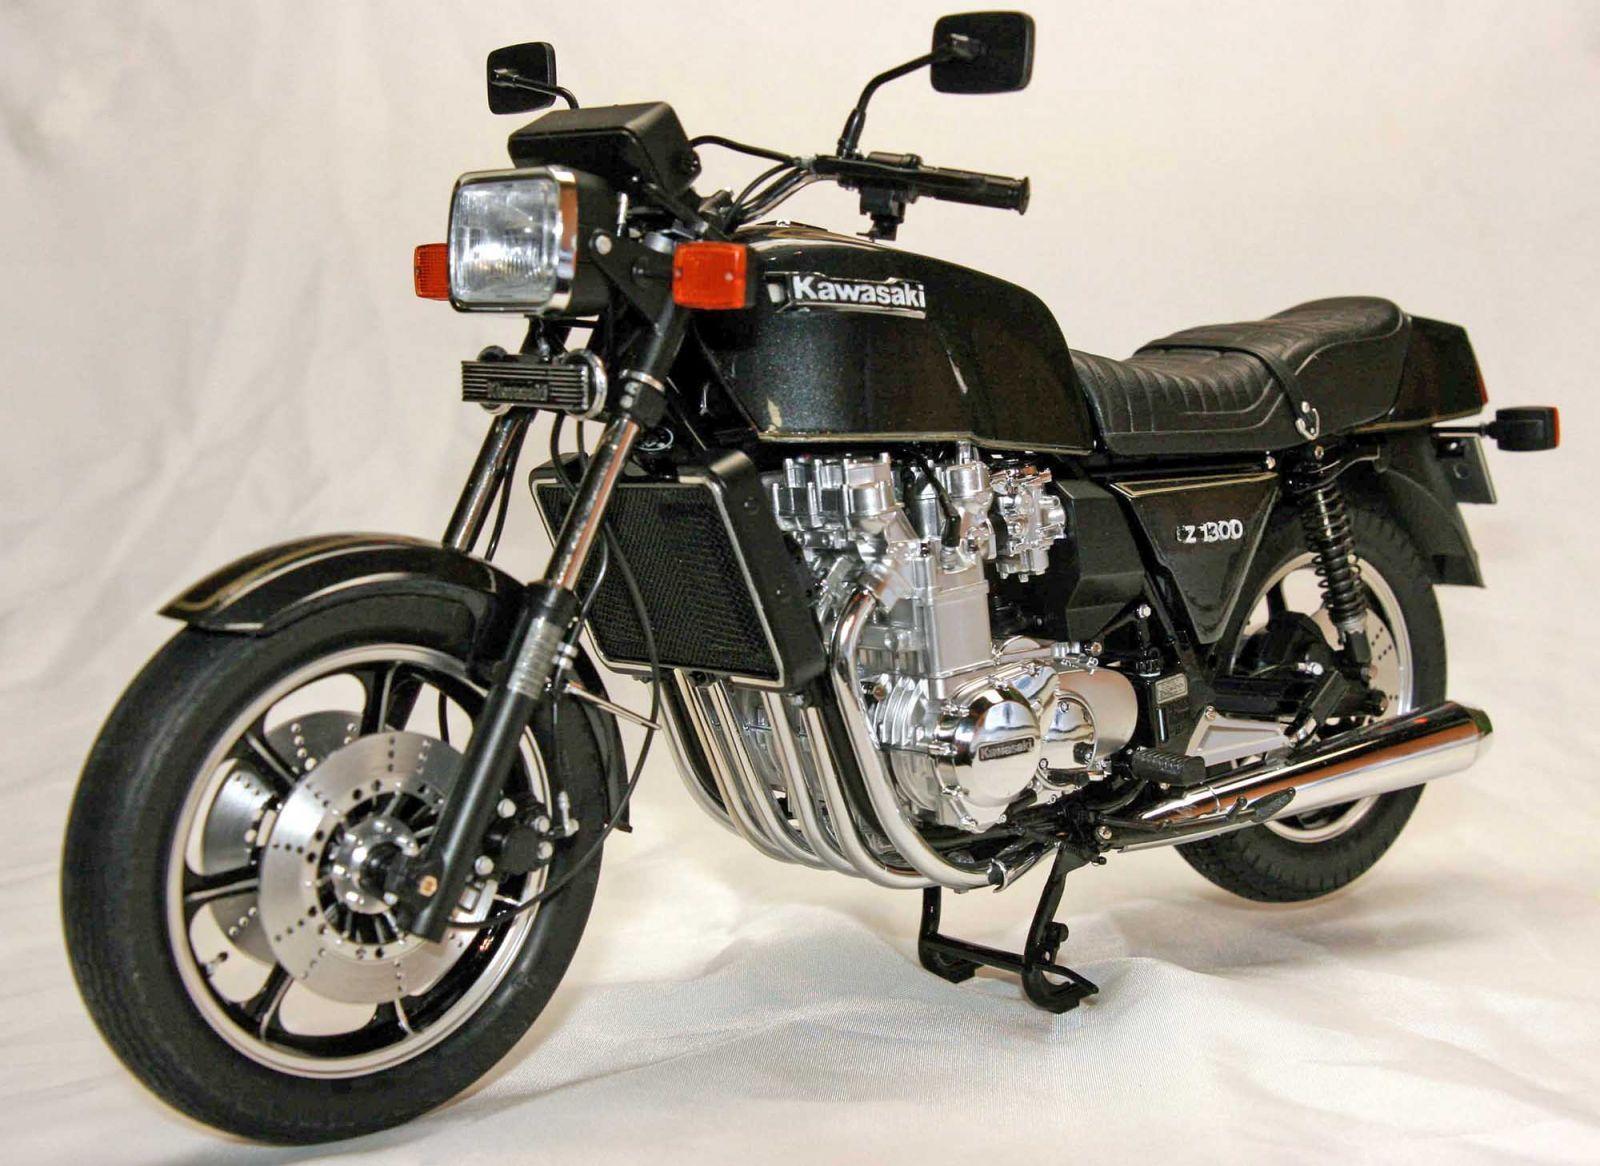 kawazaki z 1300 6 cylindres moto scooter motos d 39 occasion. Black Bedroom Furniture Sets. Home Design Ideas